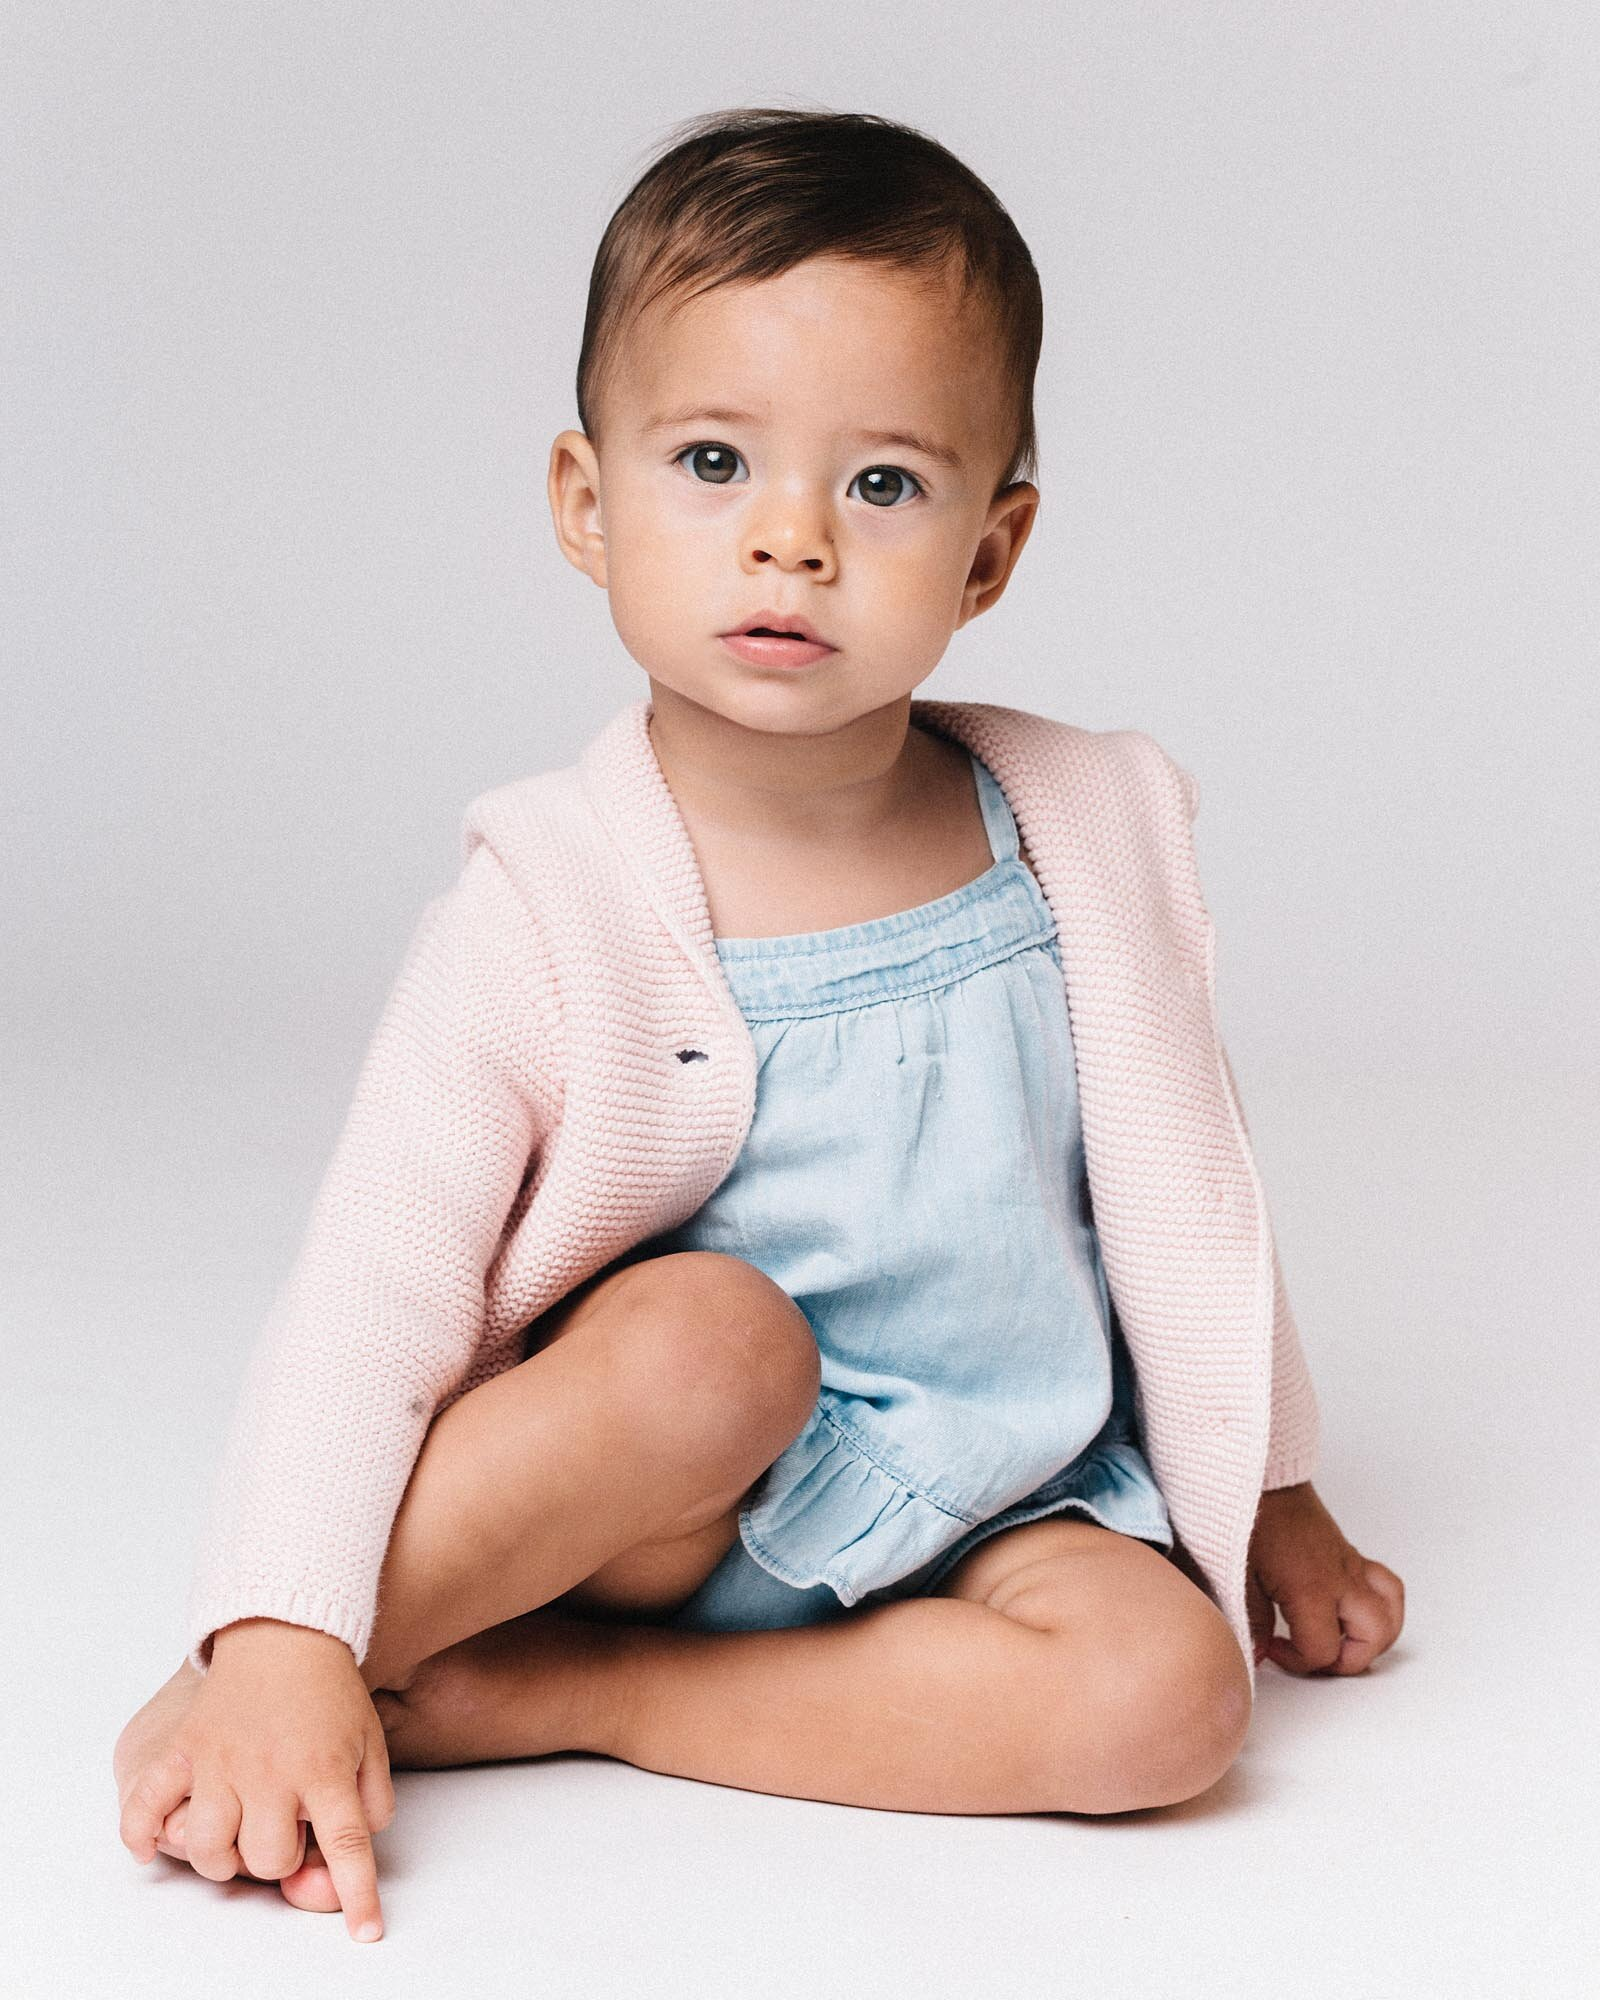 nyc-photographers-baby-modeling-nyc-10005.jpg